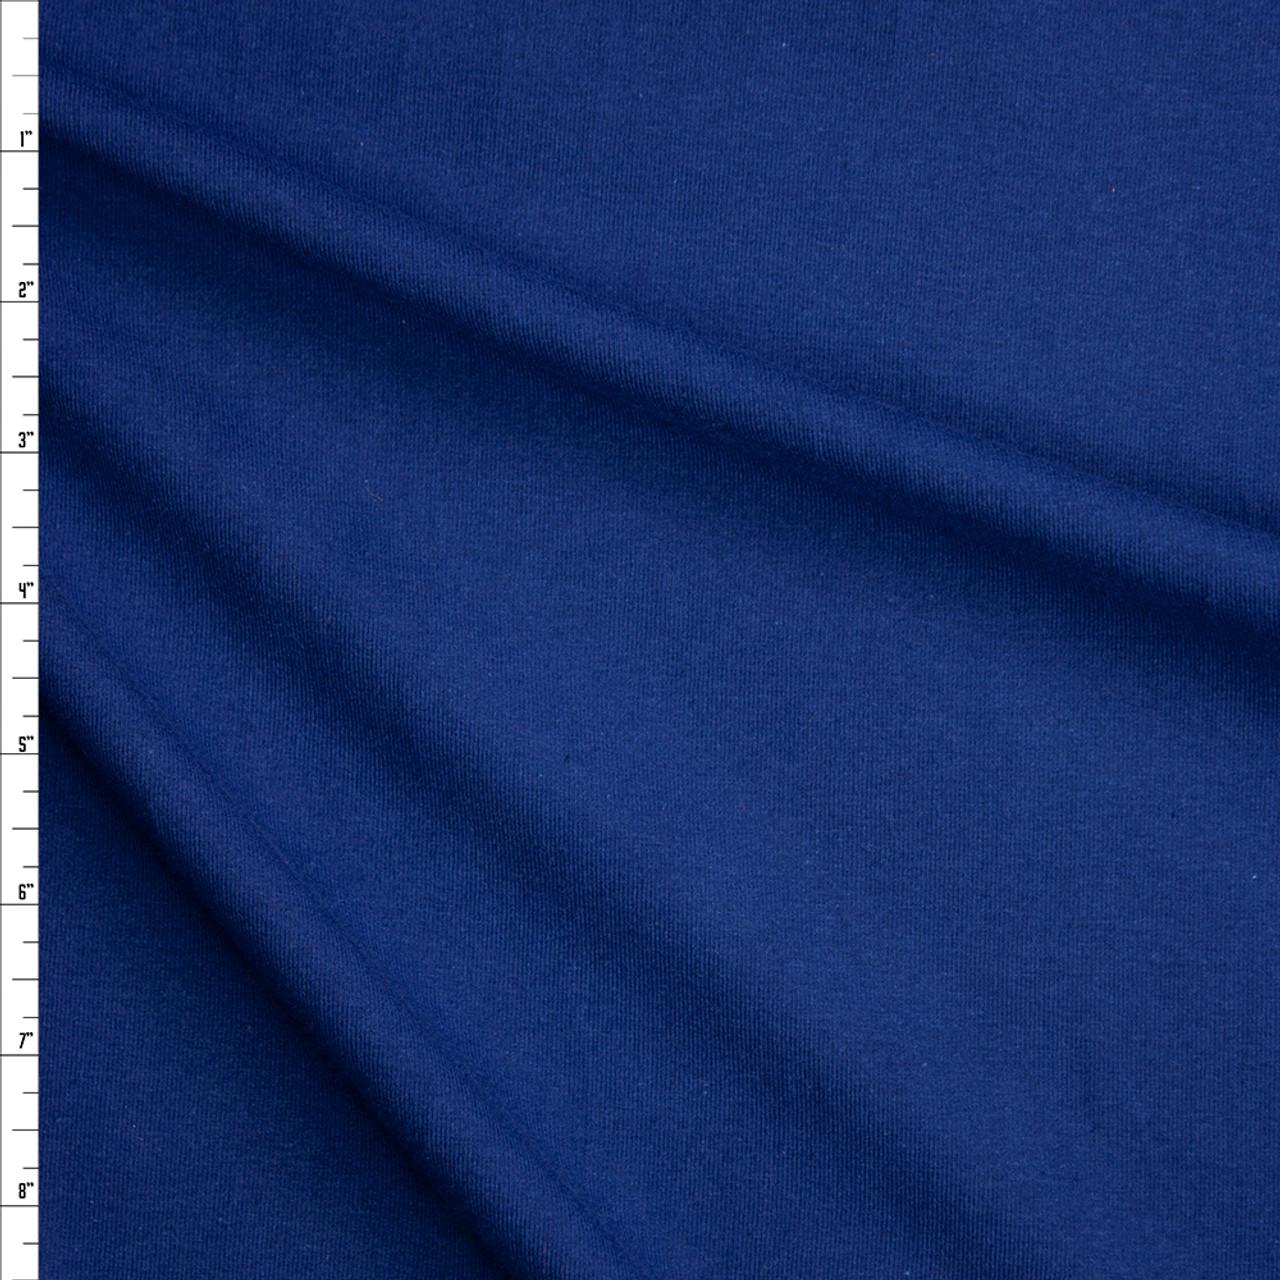 Cali Fabrics Navy Blue Stretch Midweight Cotton Jersey Knit Fabric